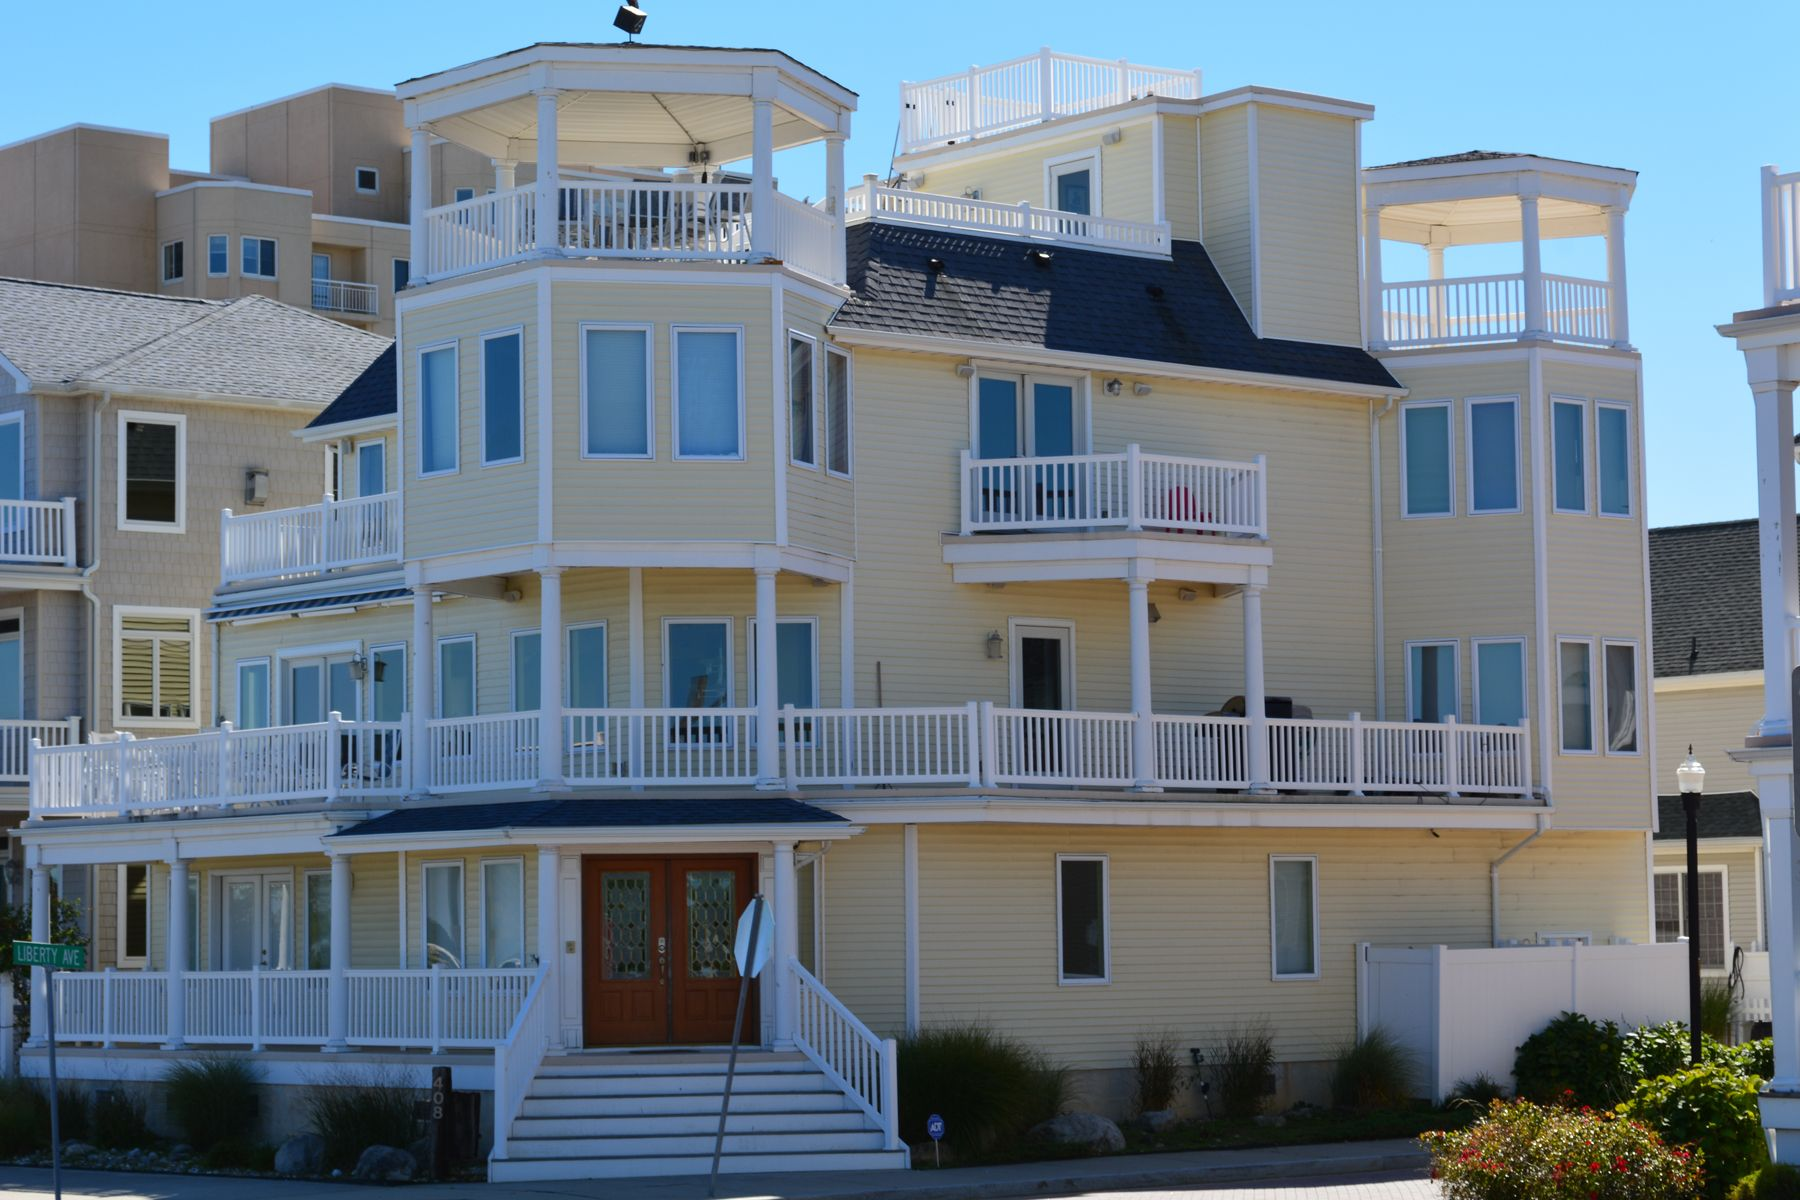 North Beach Atlantic City Nj House Styles Mansions Beach Photography